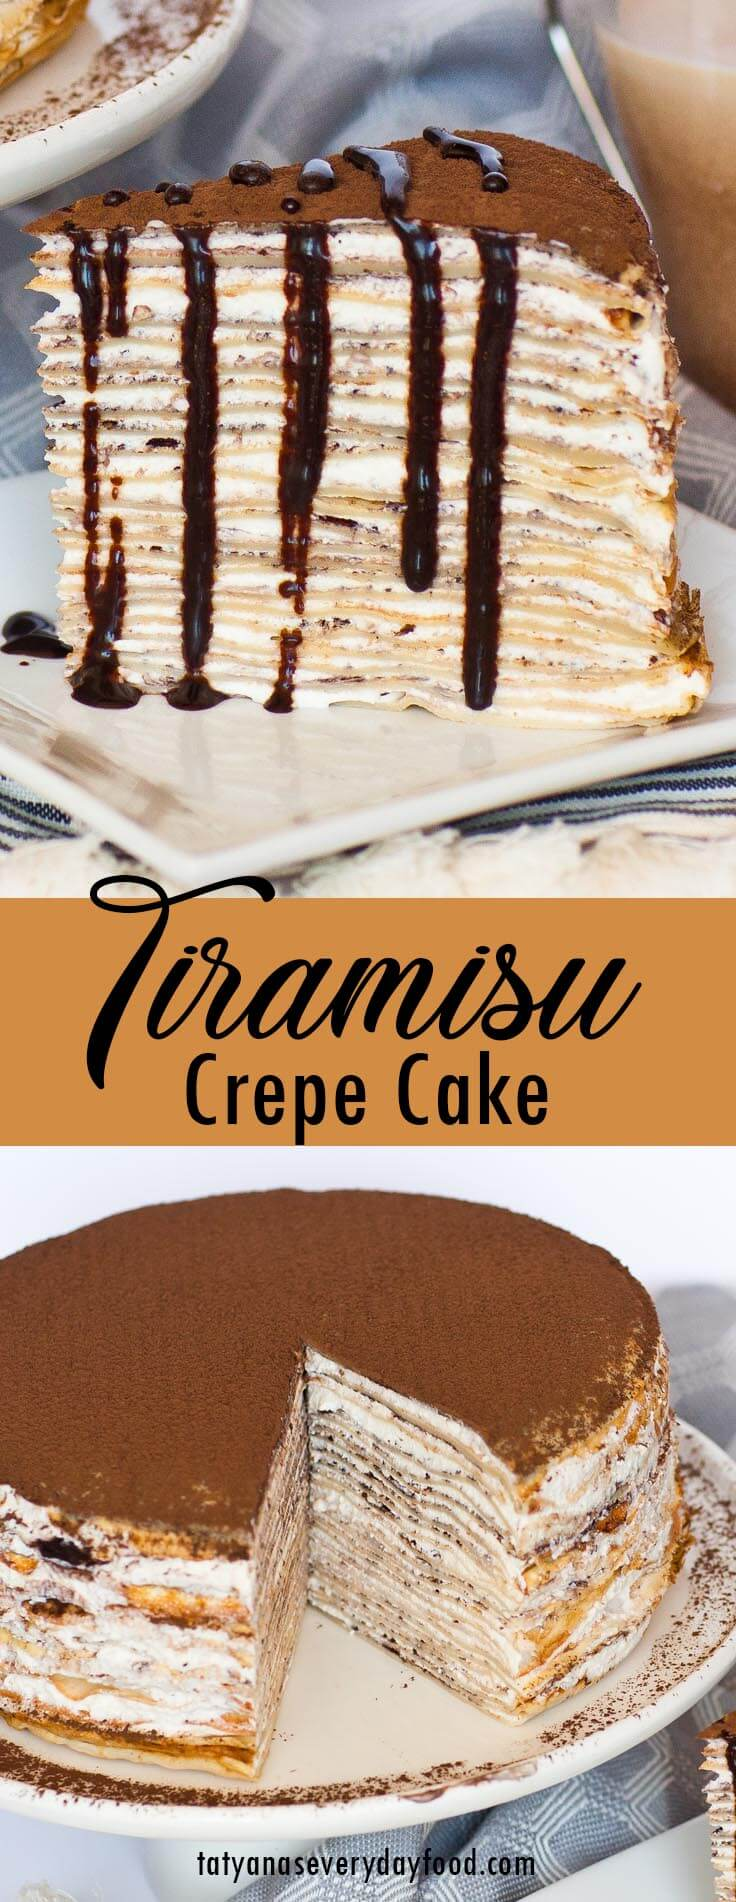 Tiramisu Crepe Cake video recipe